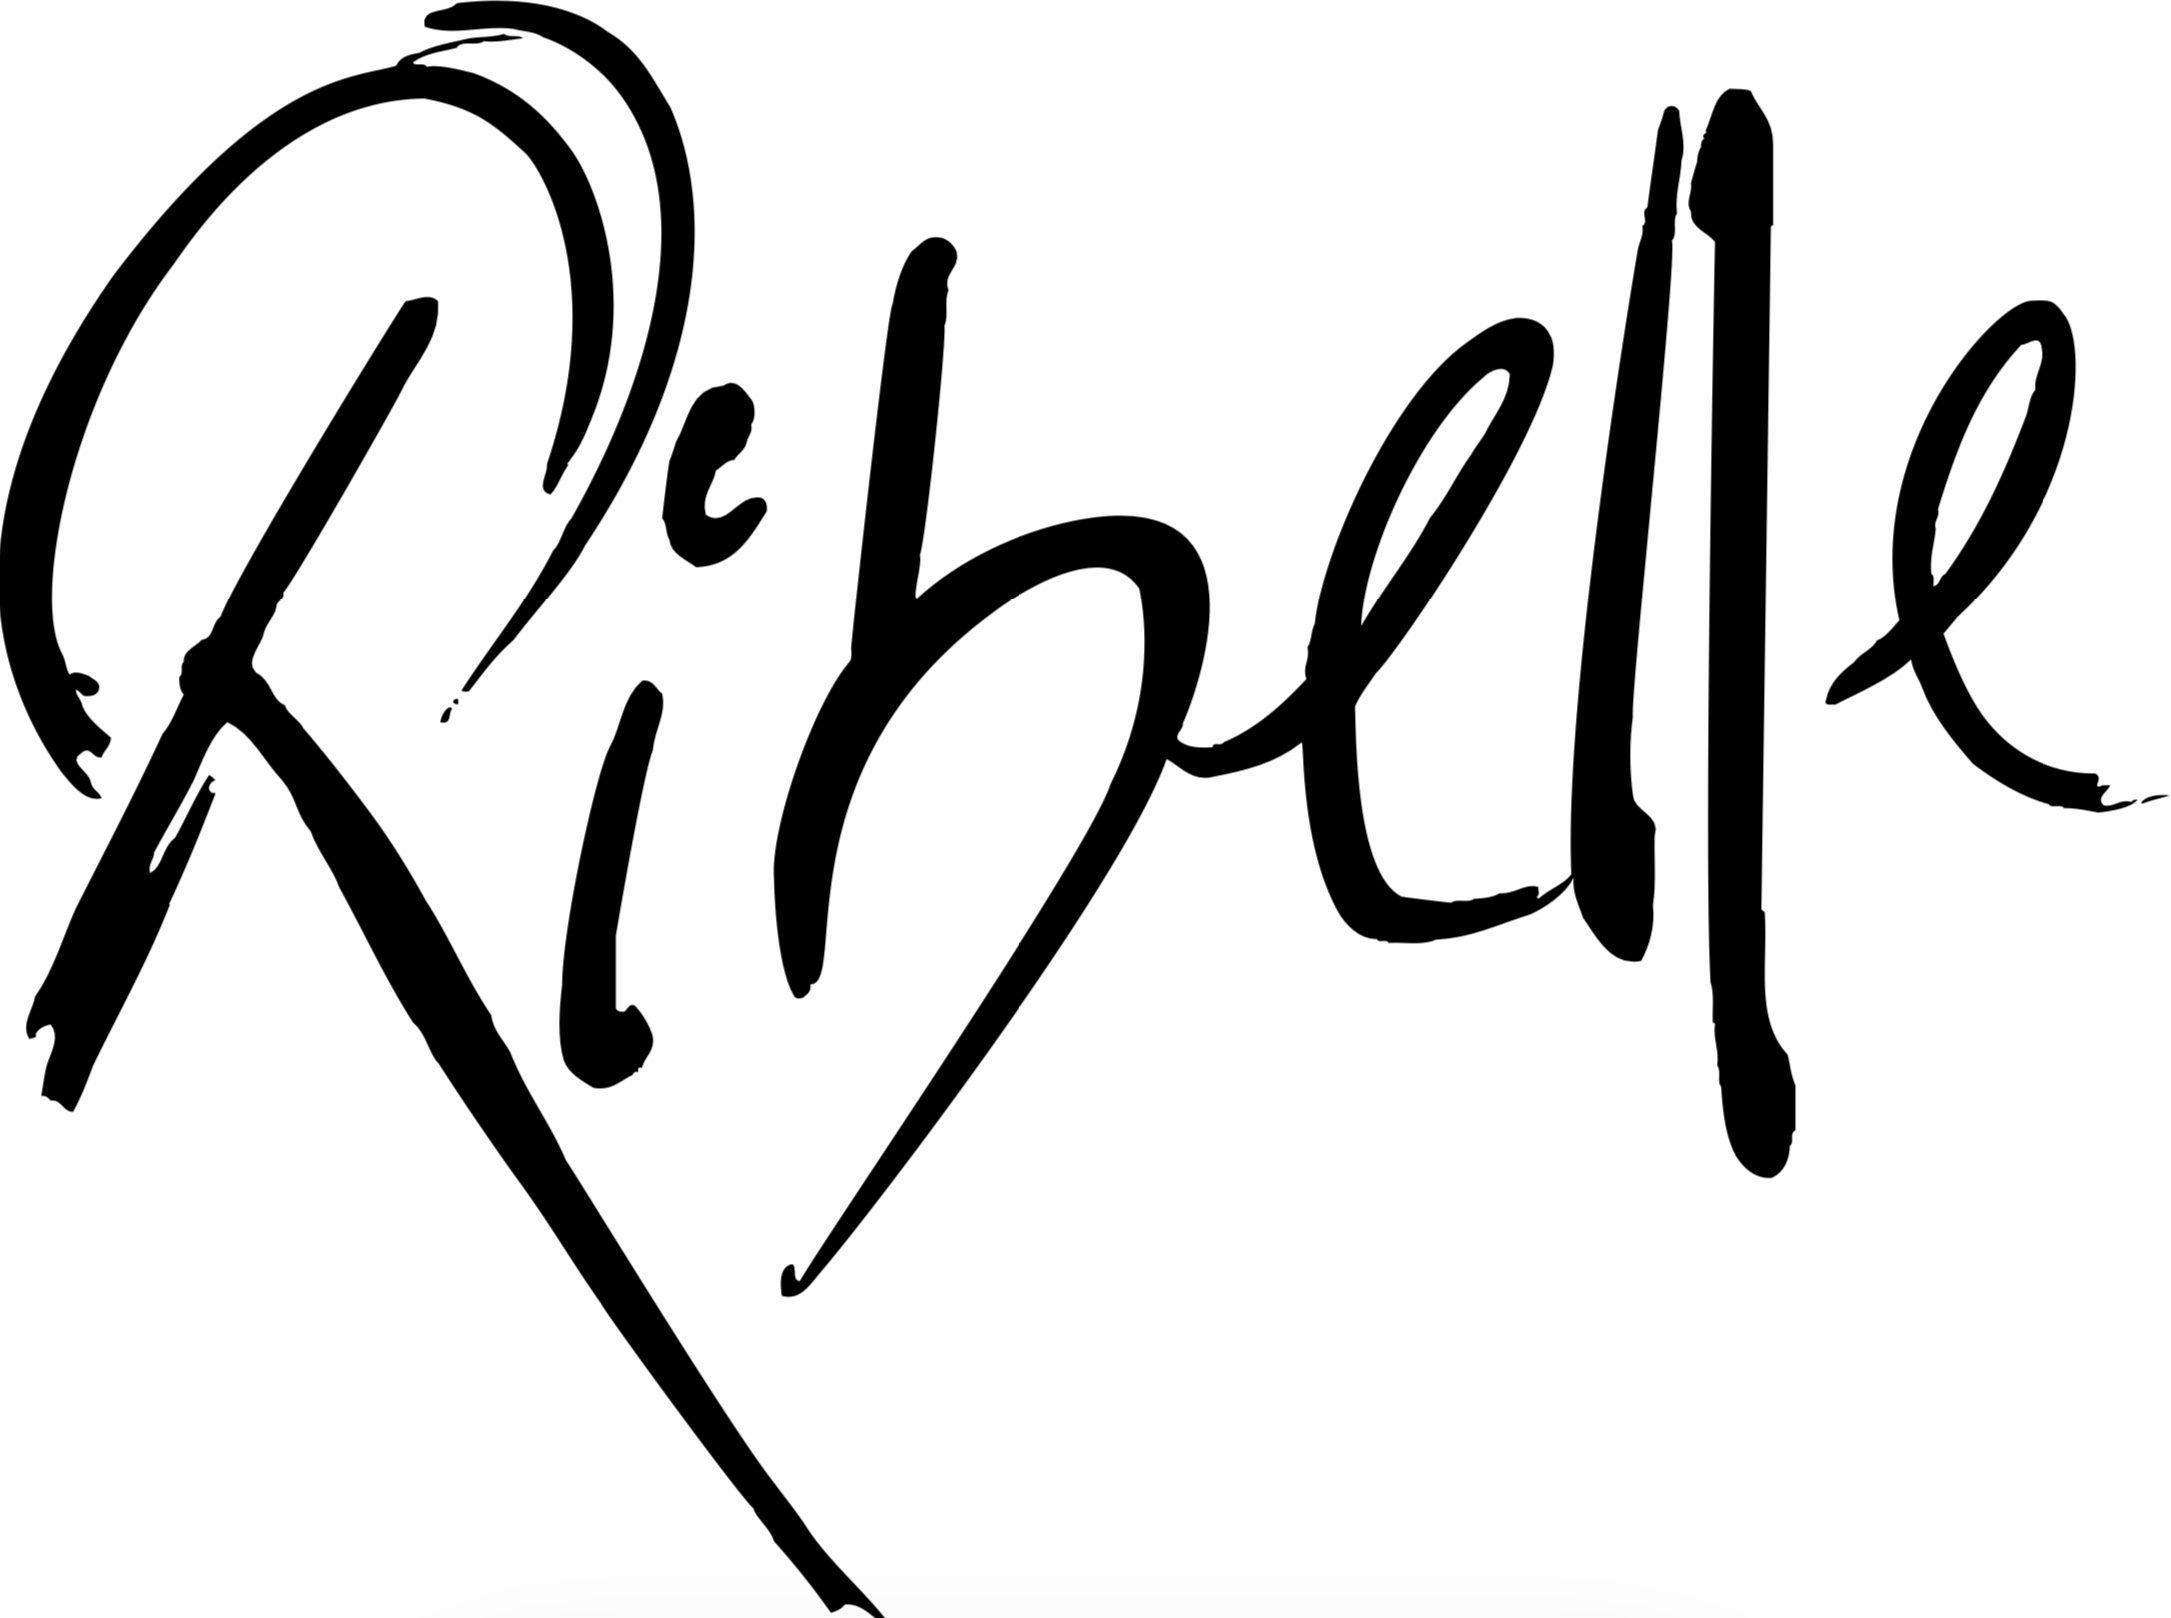 Ribelle2.0